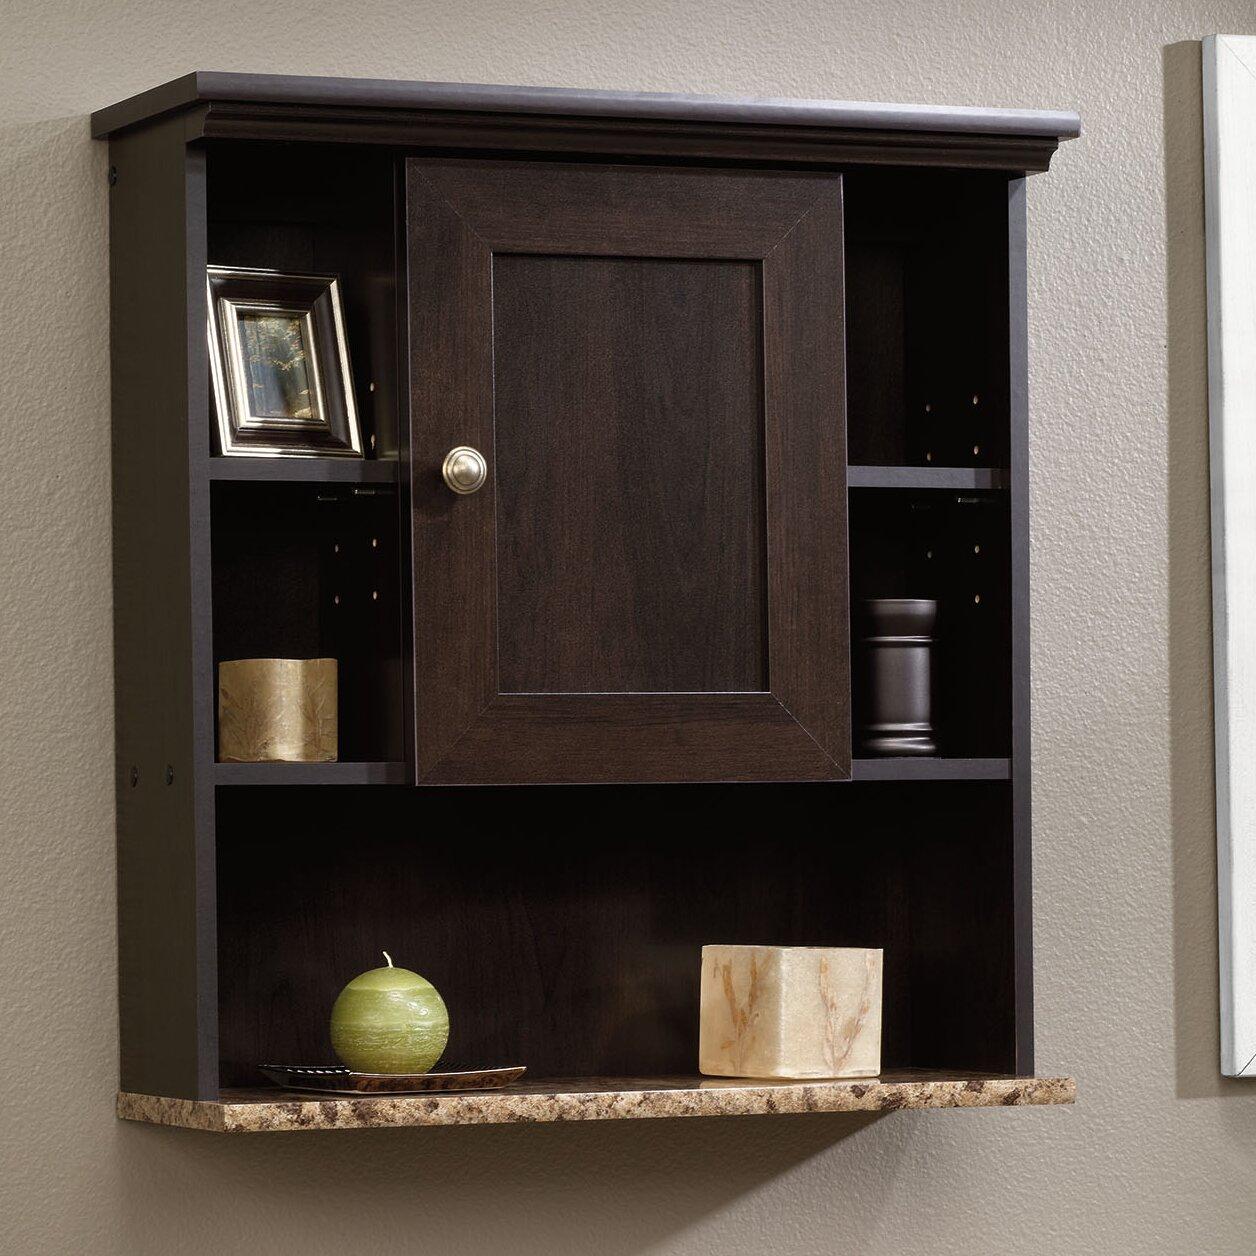 sauder peppercorn x wall mounted cabinet reviews wayfair. Black Bedroom Furniture Sets. Home Design Ideas